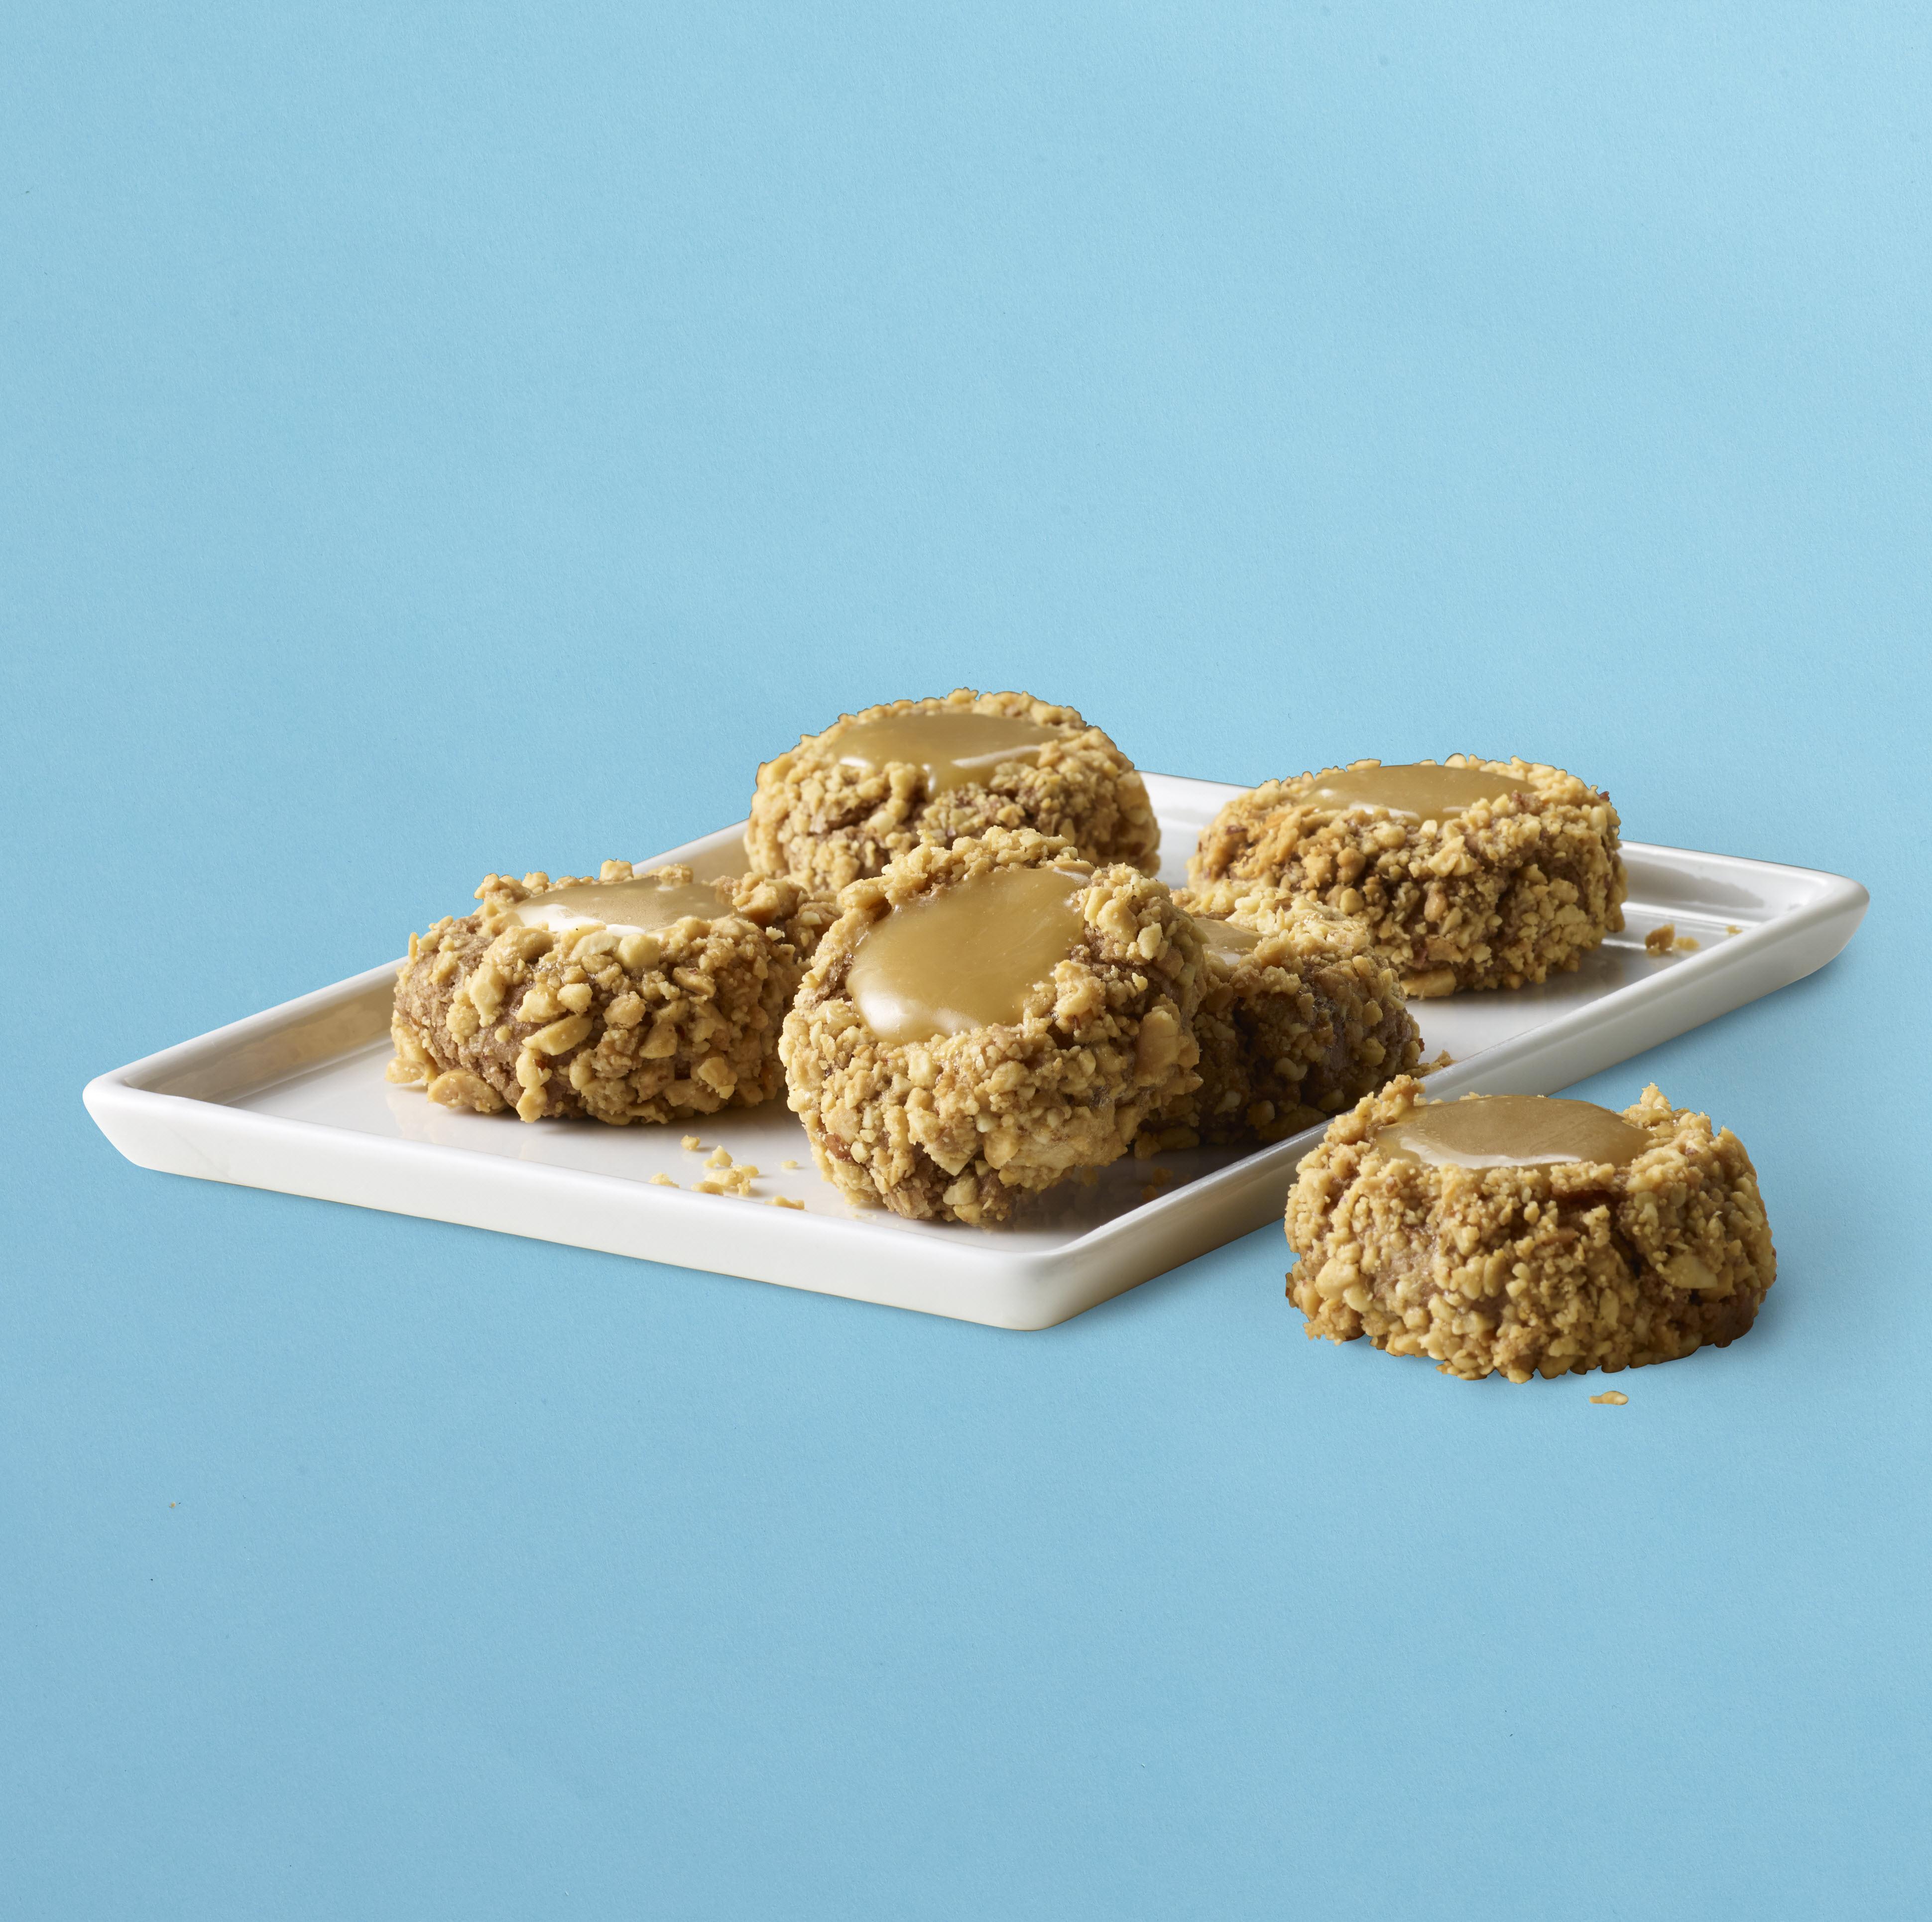 Peanut Butter Caramel Thumbprint Cookies